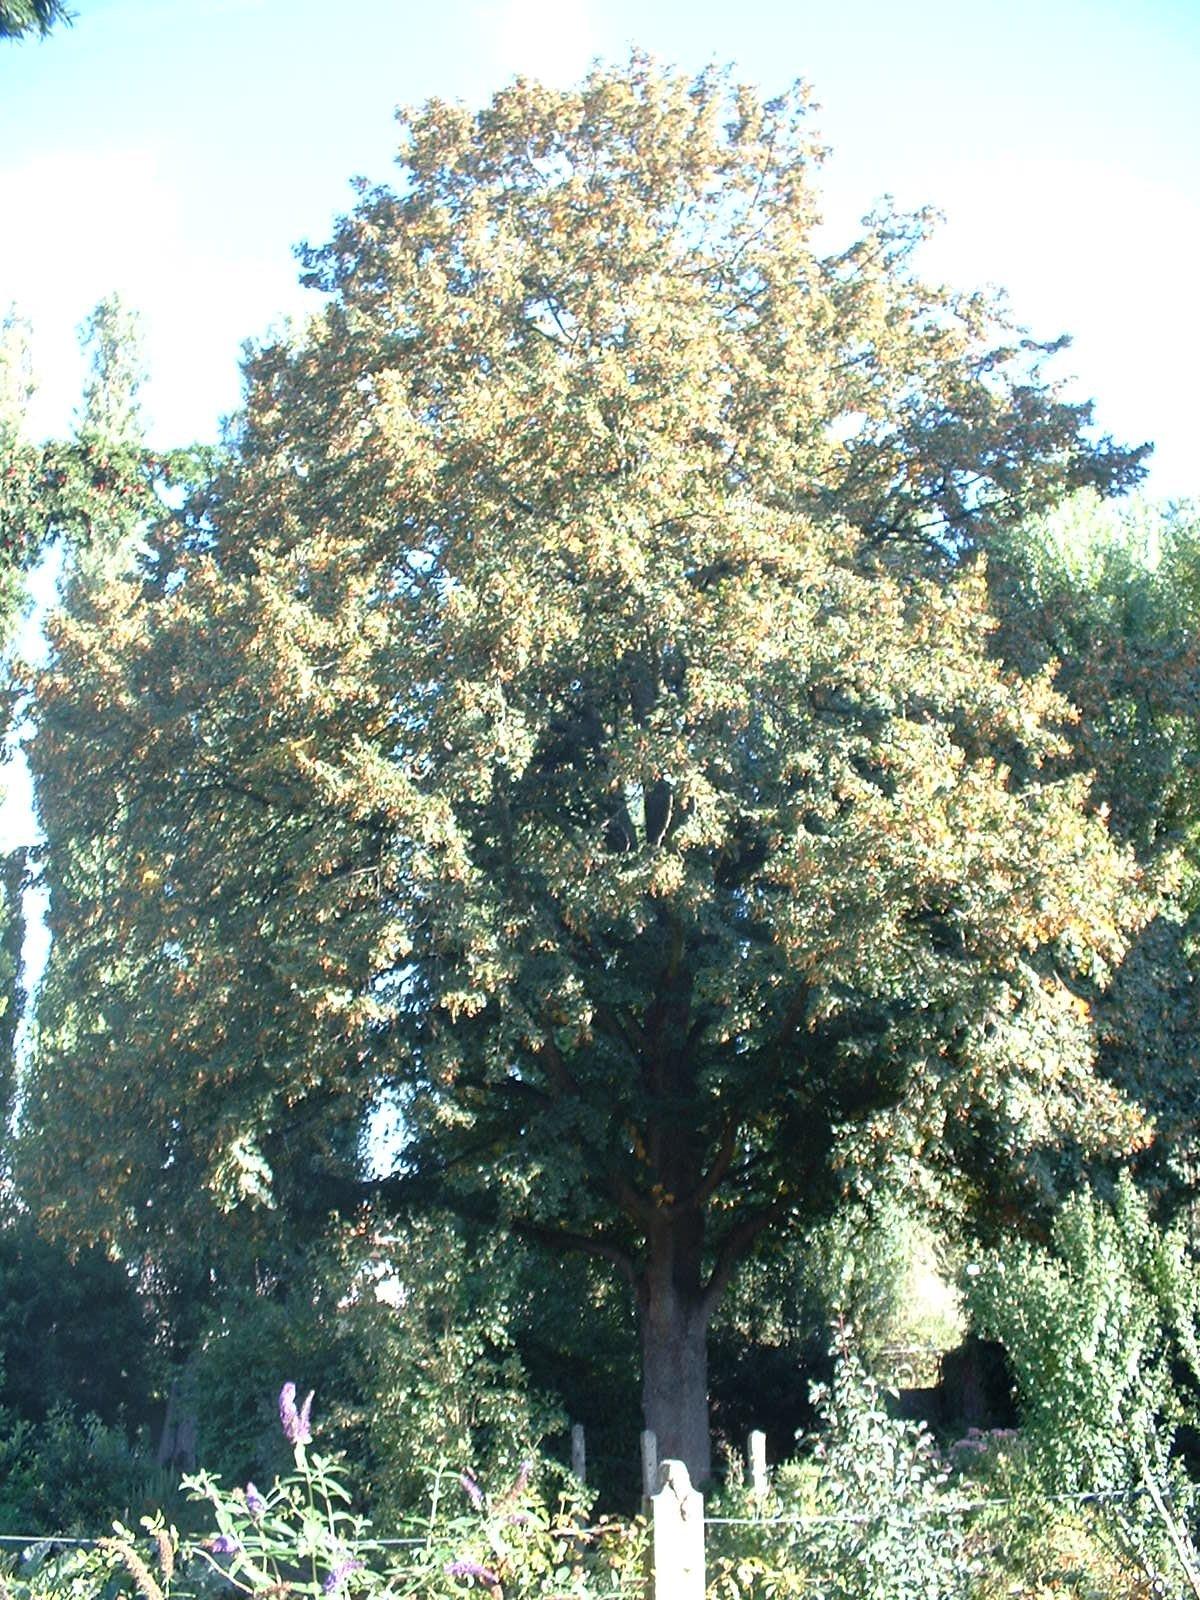 Tilleul à petites feuilles – Molenbeek-Saint-Jean, Rue Joseph Schols, 62 –  15 Septembre 2003